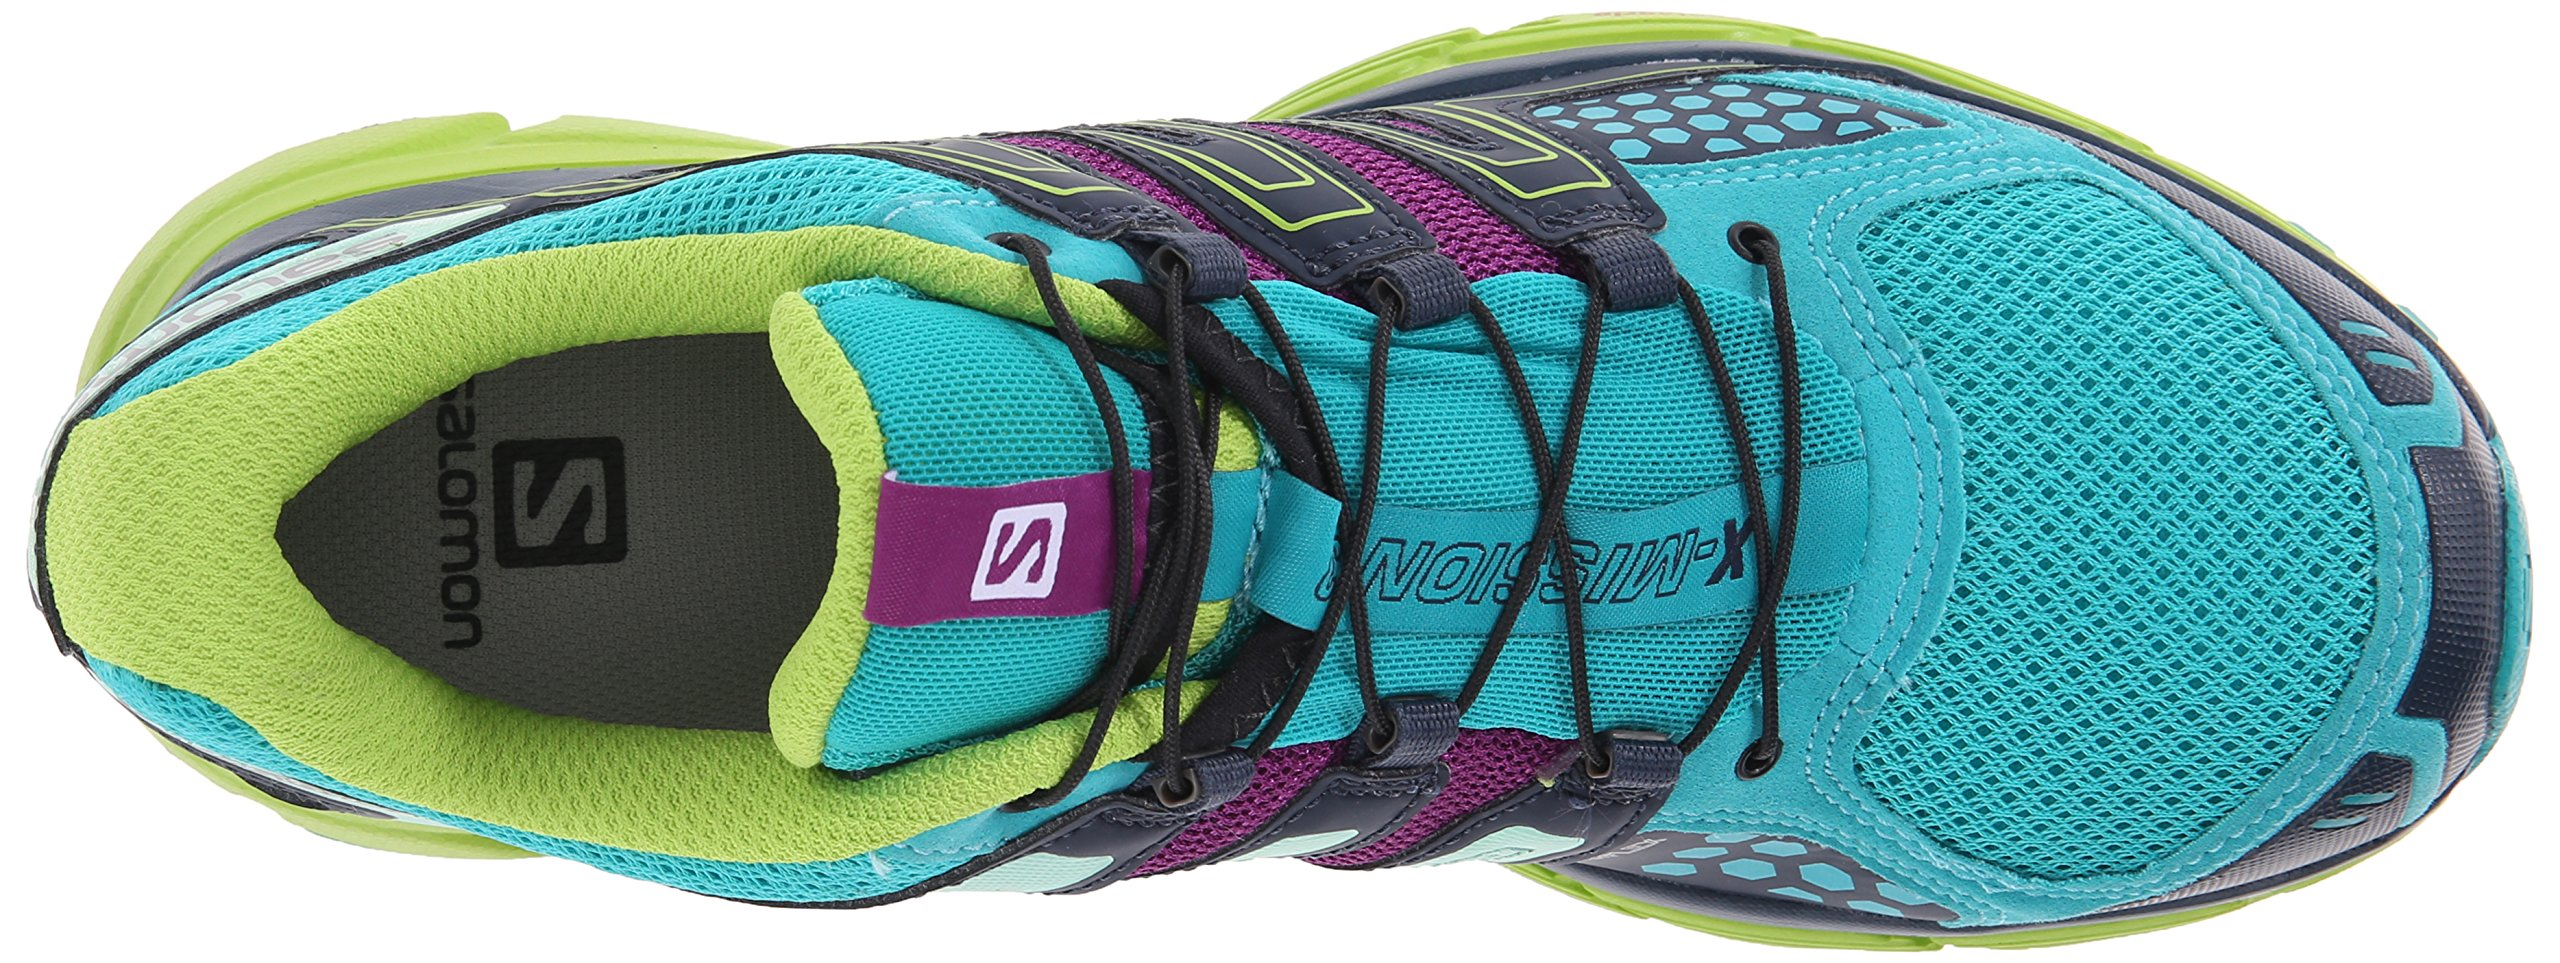 Salomon Women's X-Mission 3 W Trail Running Shoe, Teal Blue/Granny Green/Passion Purple, 7.5 B US by Salomon (Image #8)